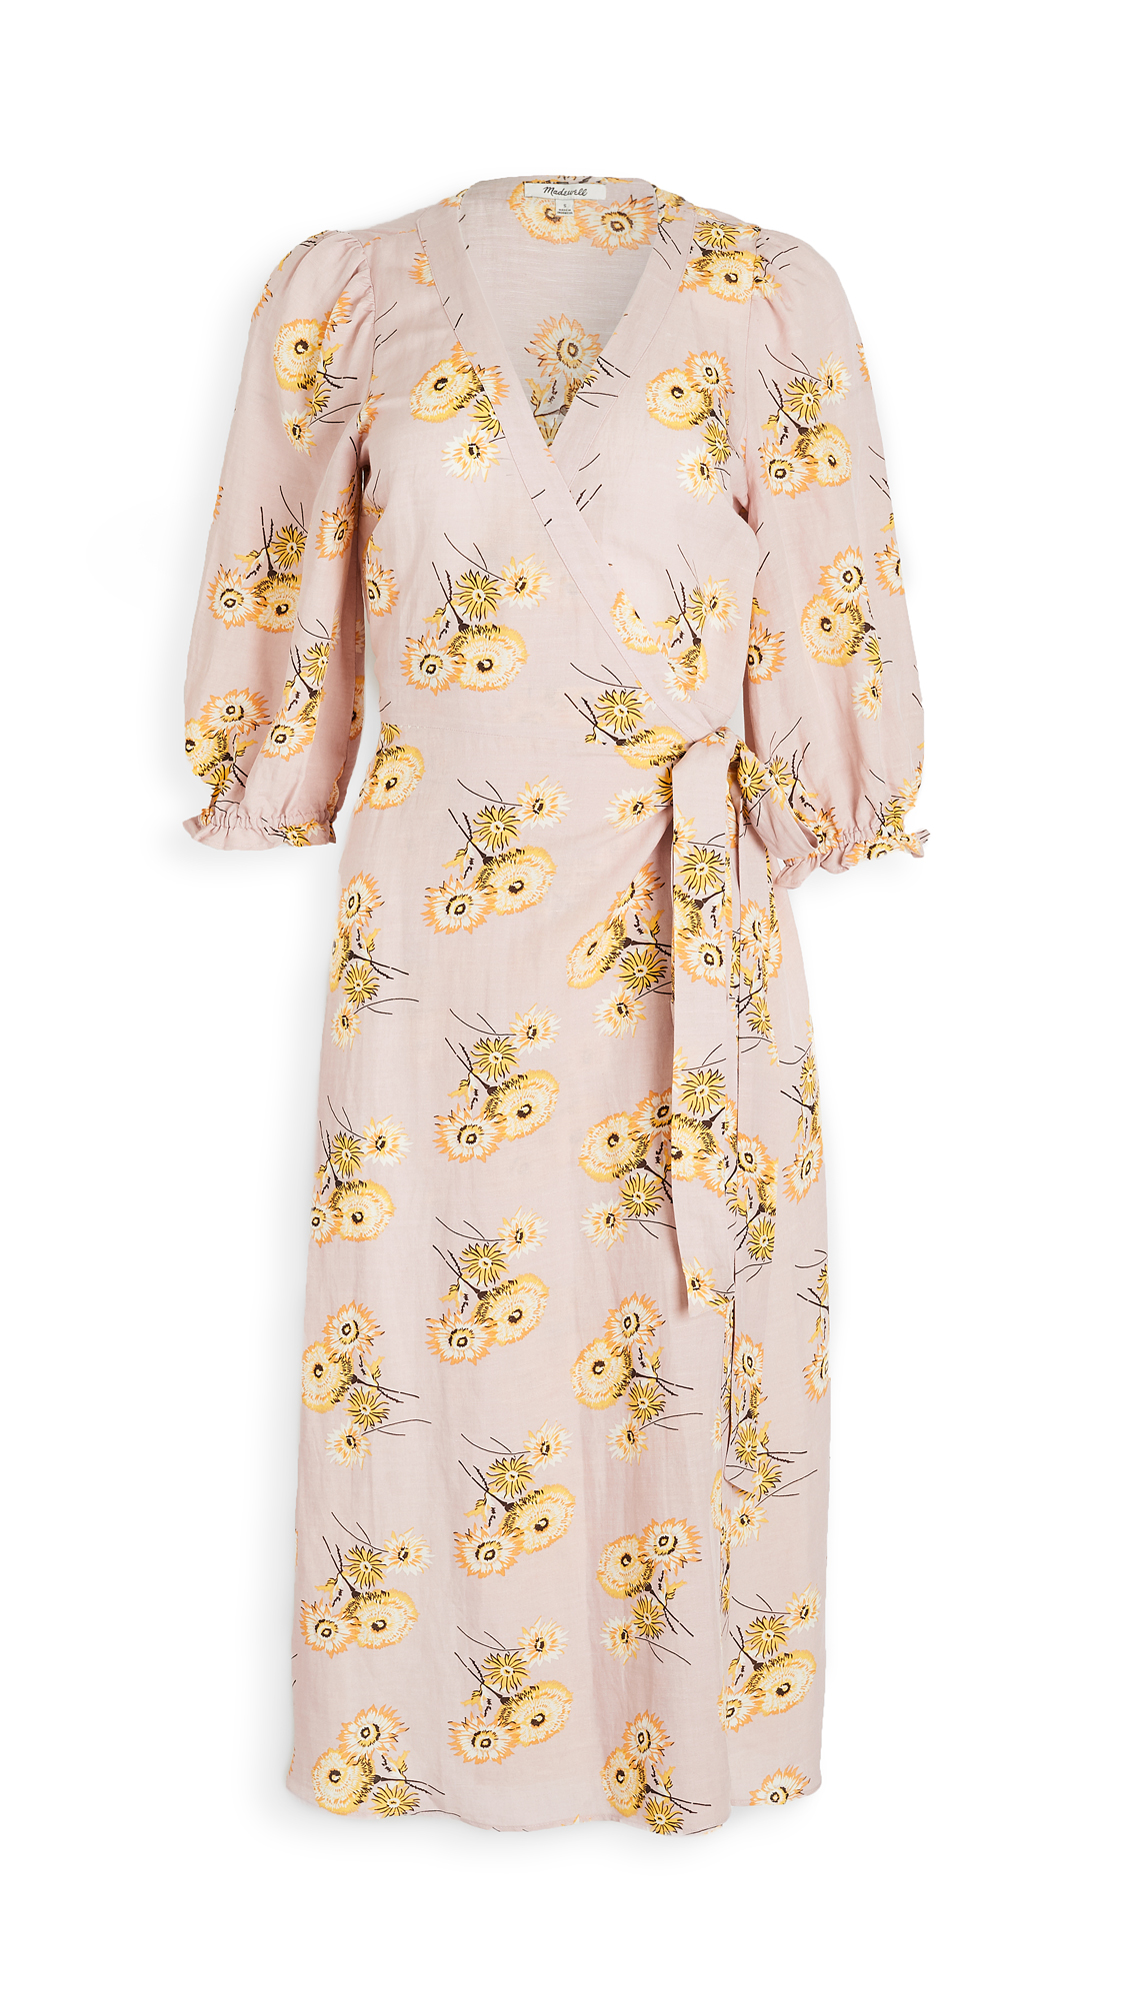 Madewell Floral Wrap Dress